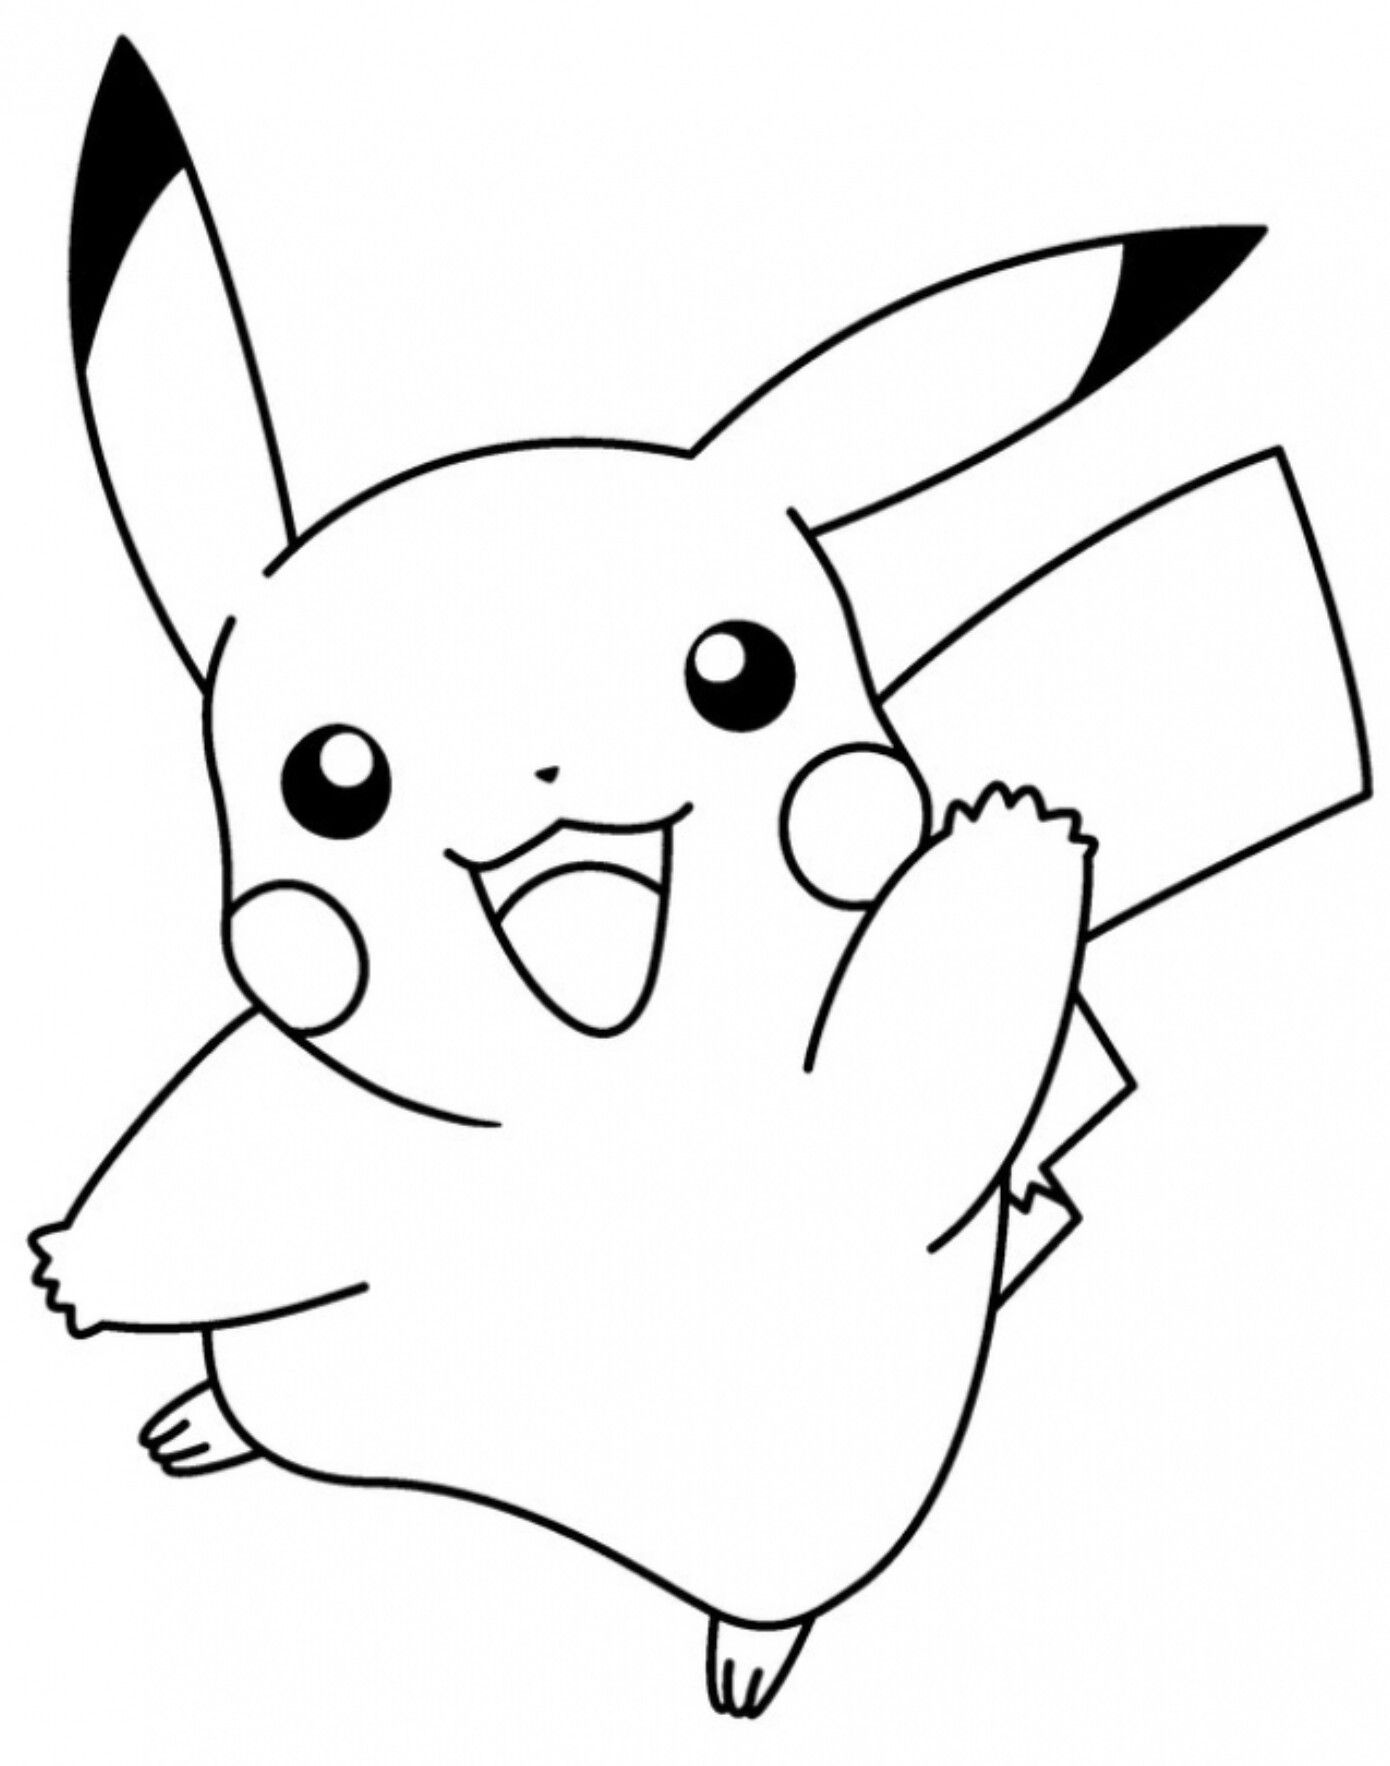 Pin by Vanja Radovic on bojanka Pikachu drawing Pokemon